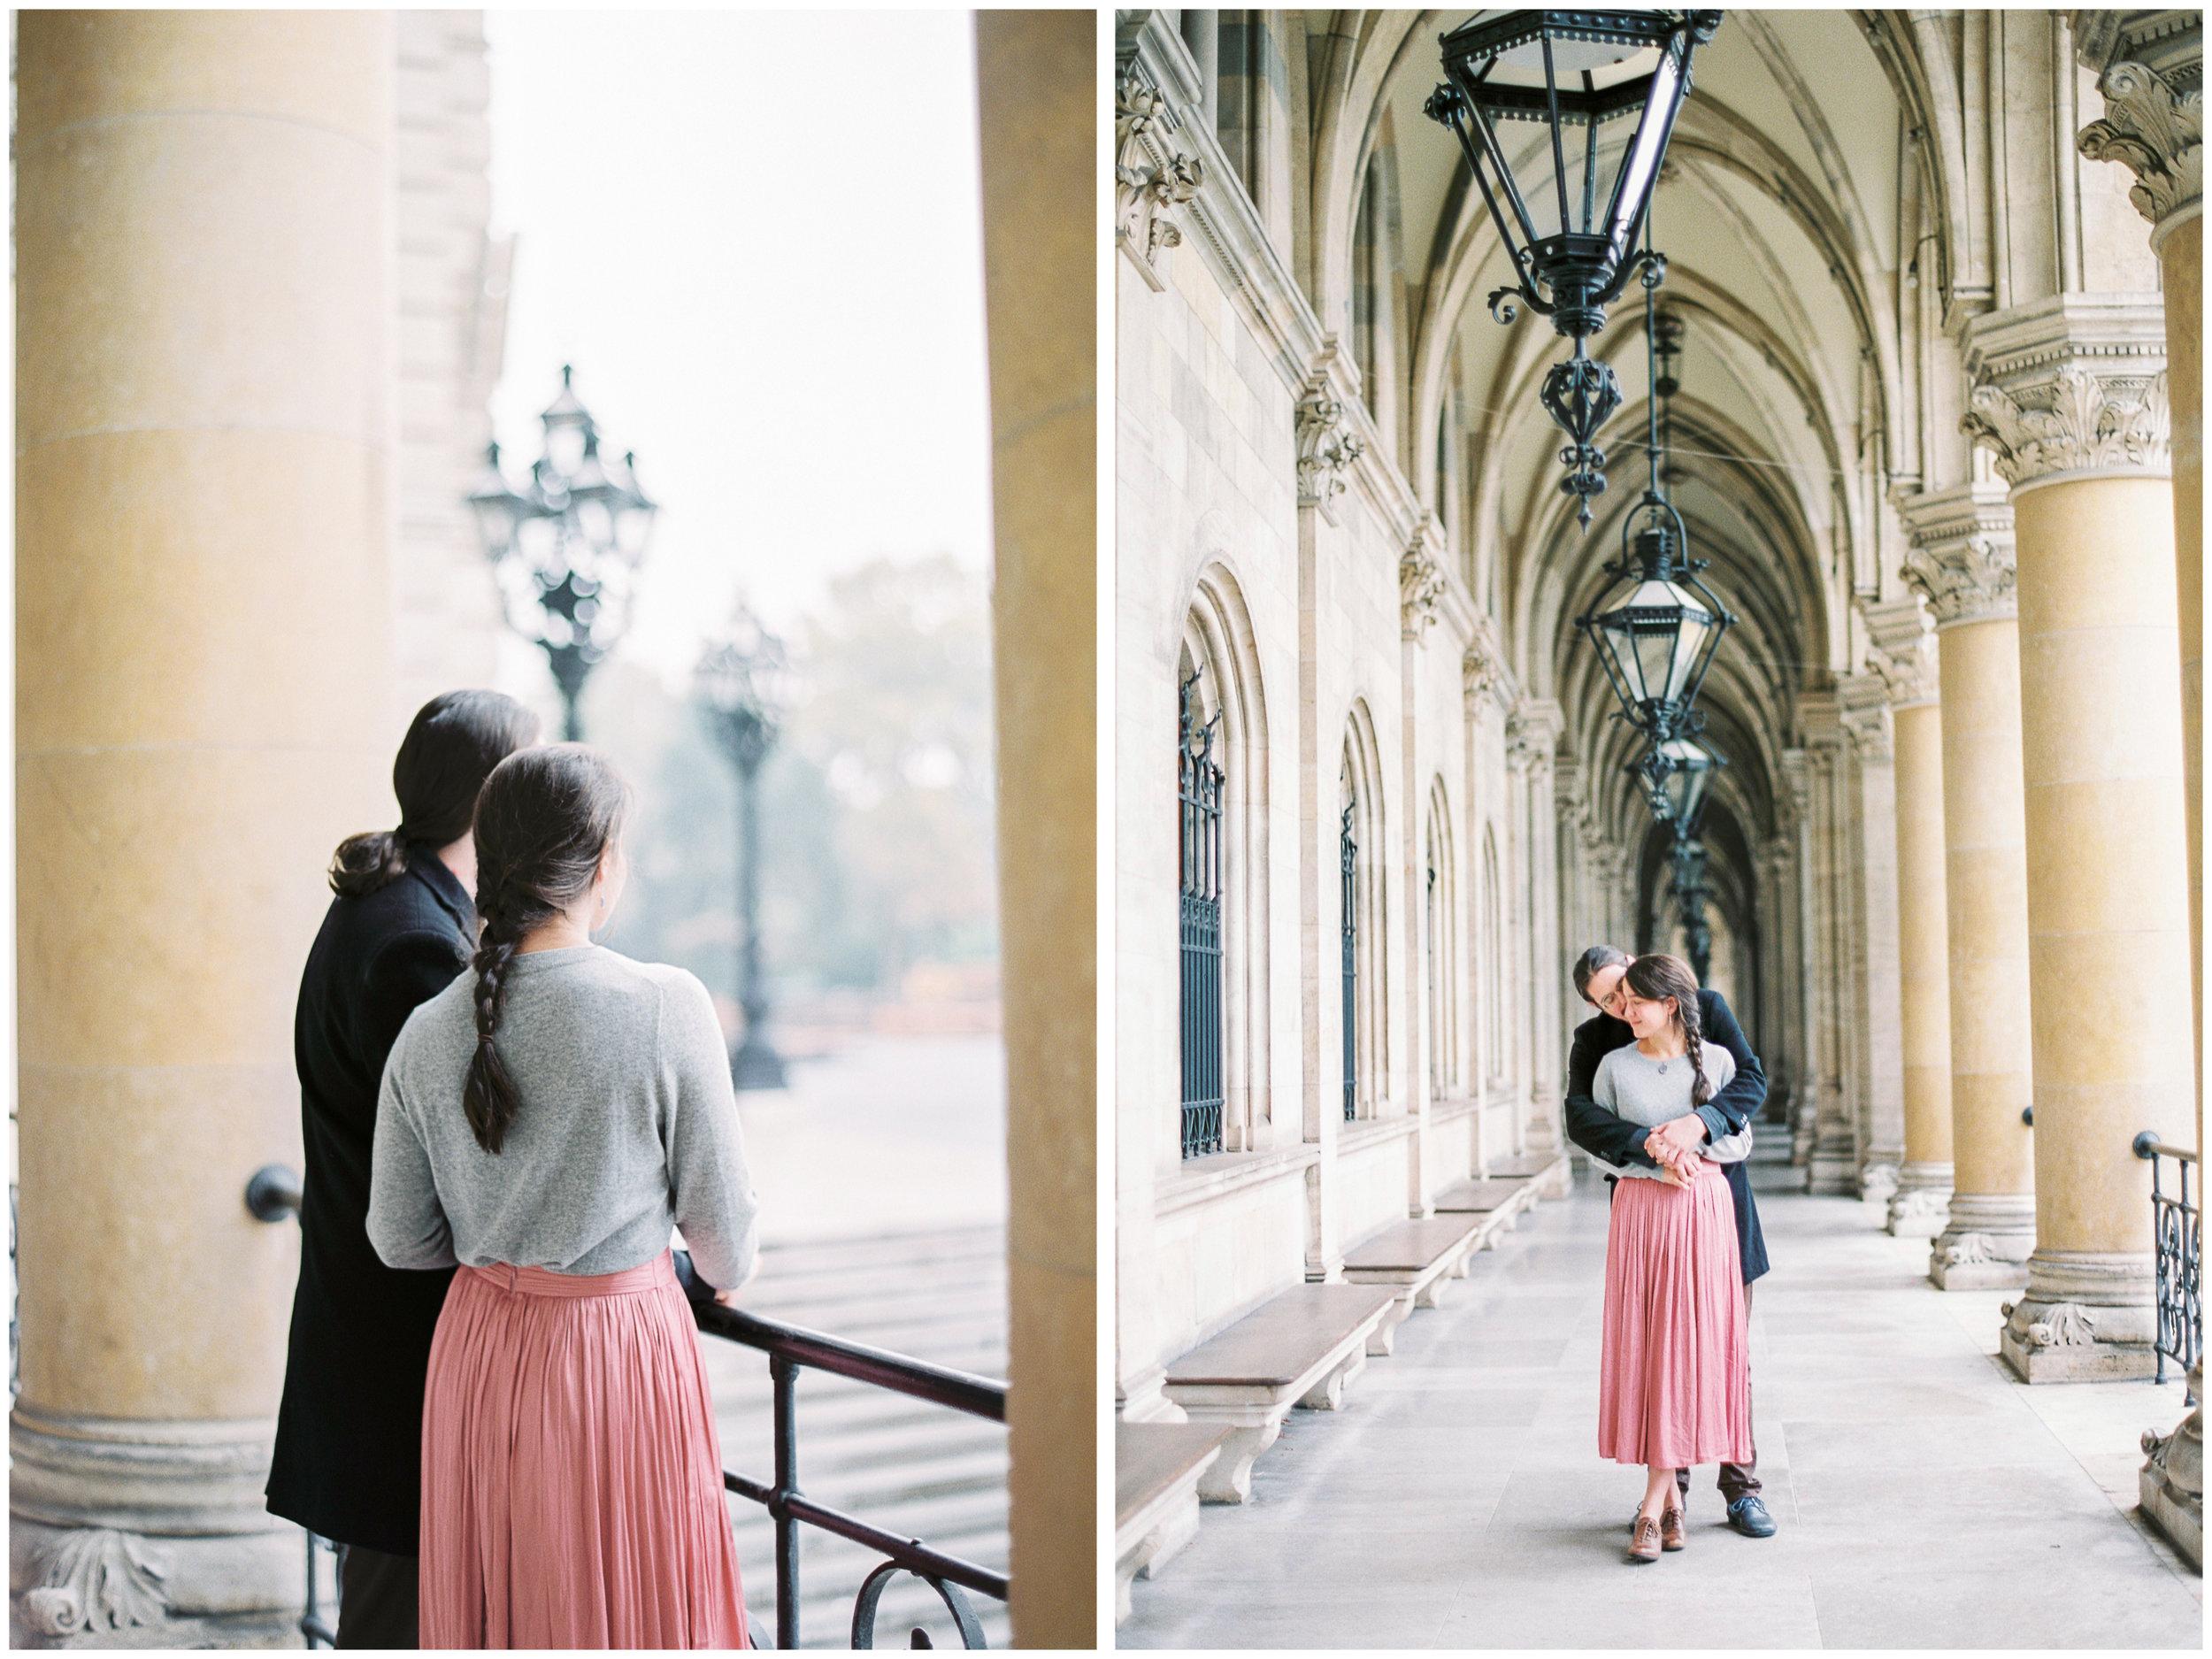 Anniversary Photos | Vienna, Austria | Fuji400H | Contax645 | Vienna Film Photographer | Michelle Mock Photography